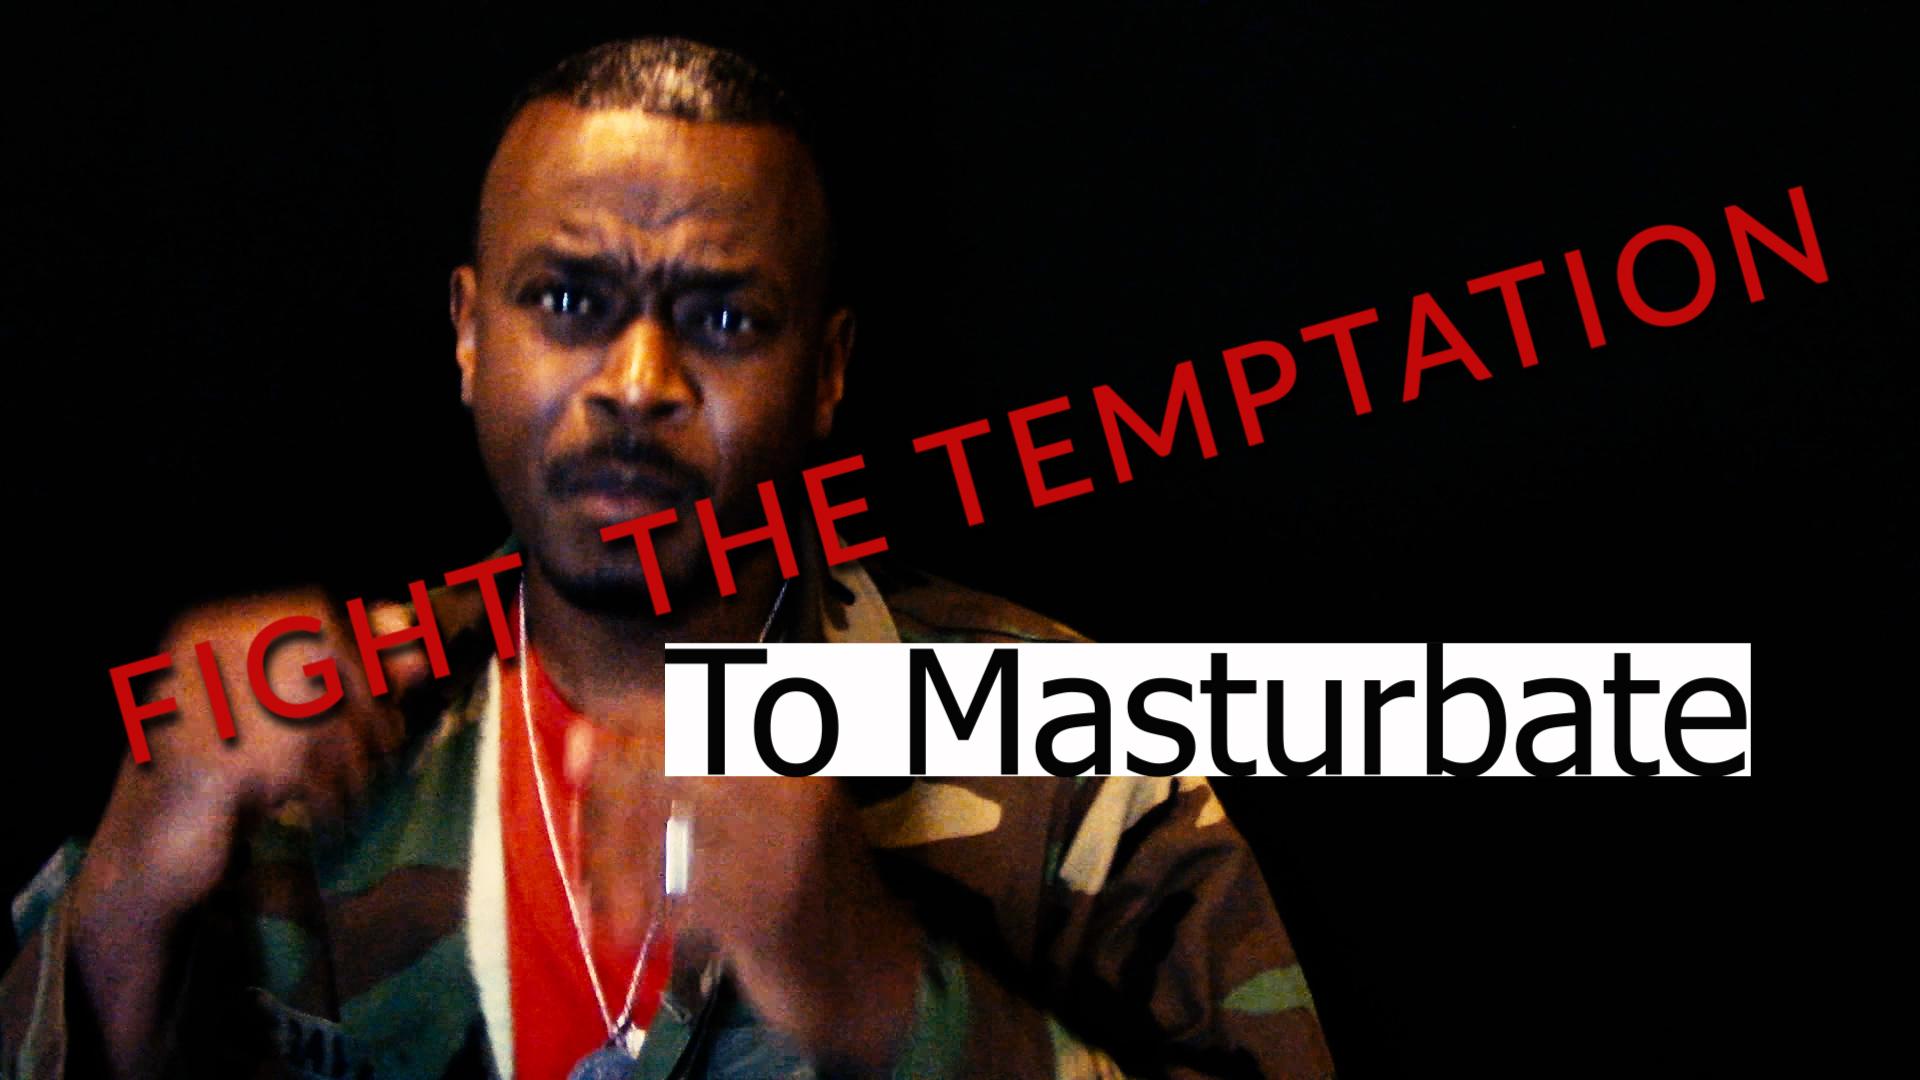 Too masturbation god bible